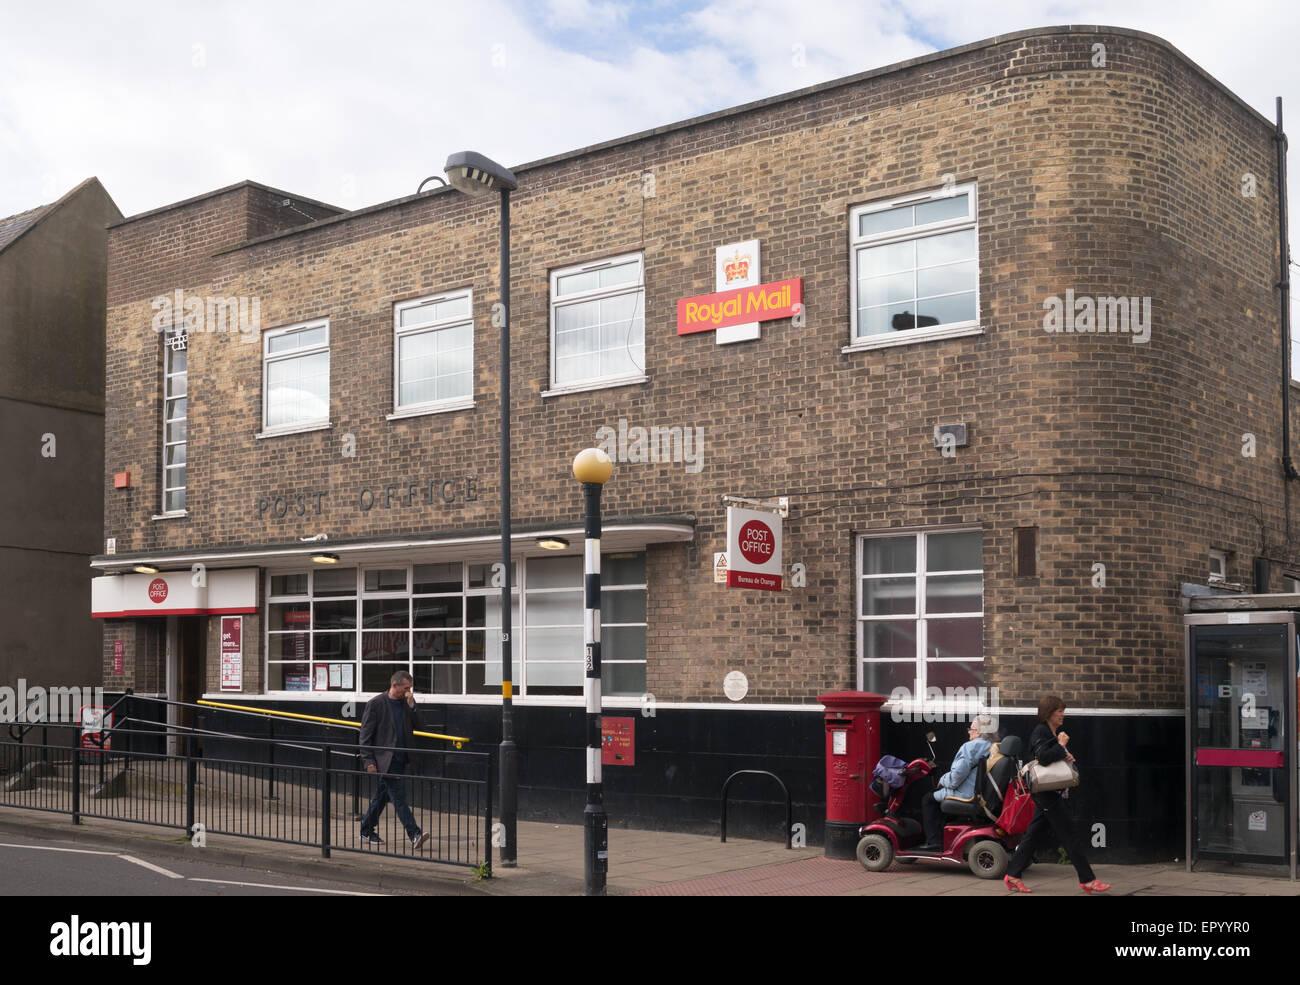 art deco style 1930s post office building chester le street co durham england uk art deco office building